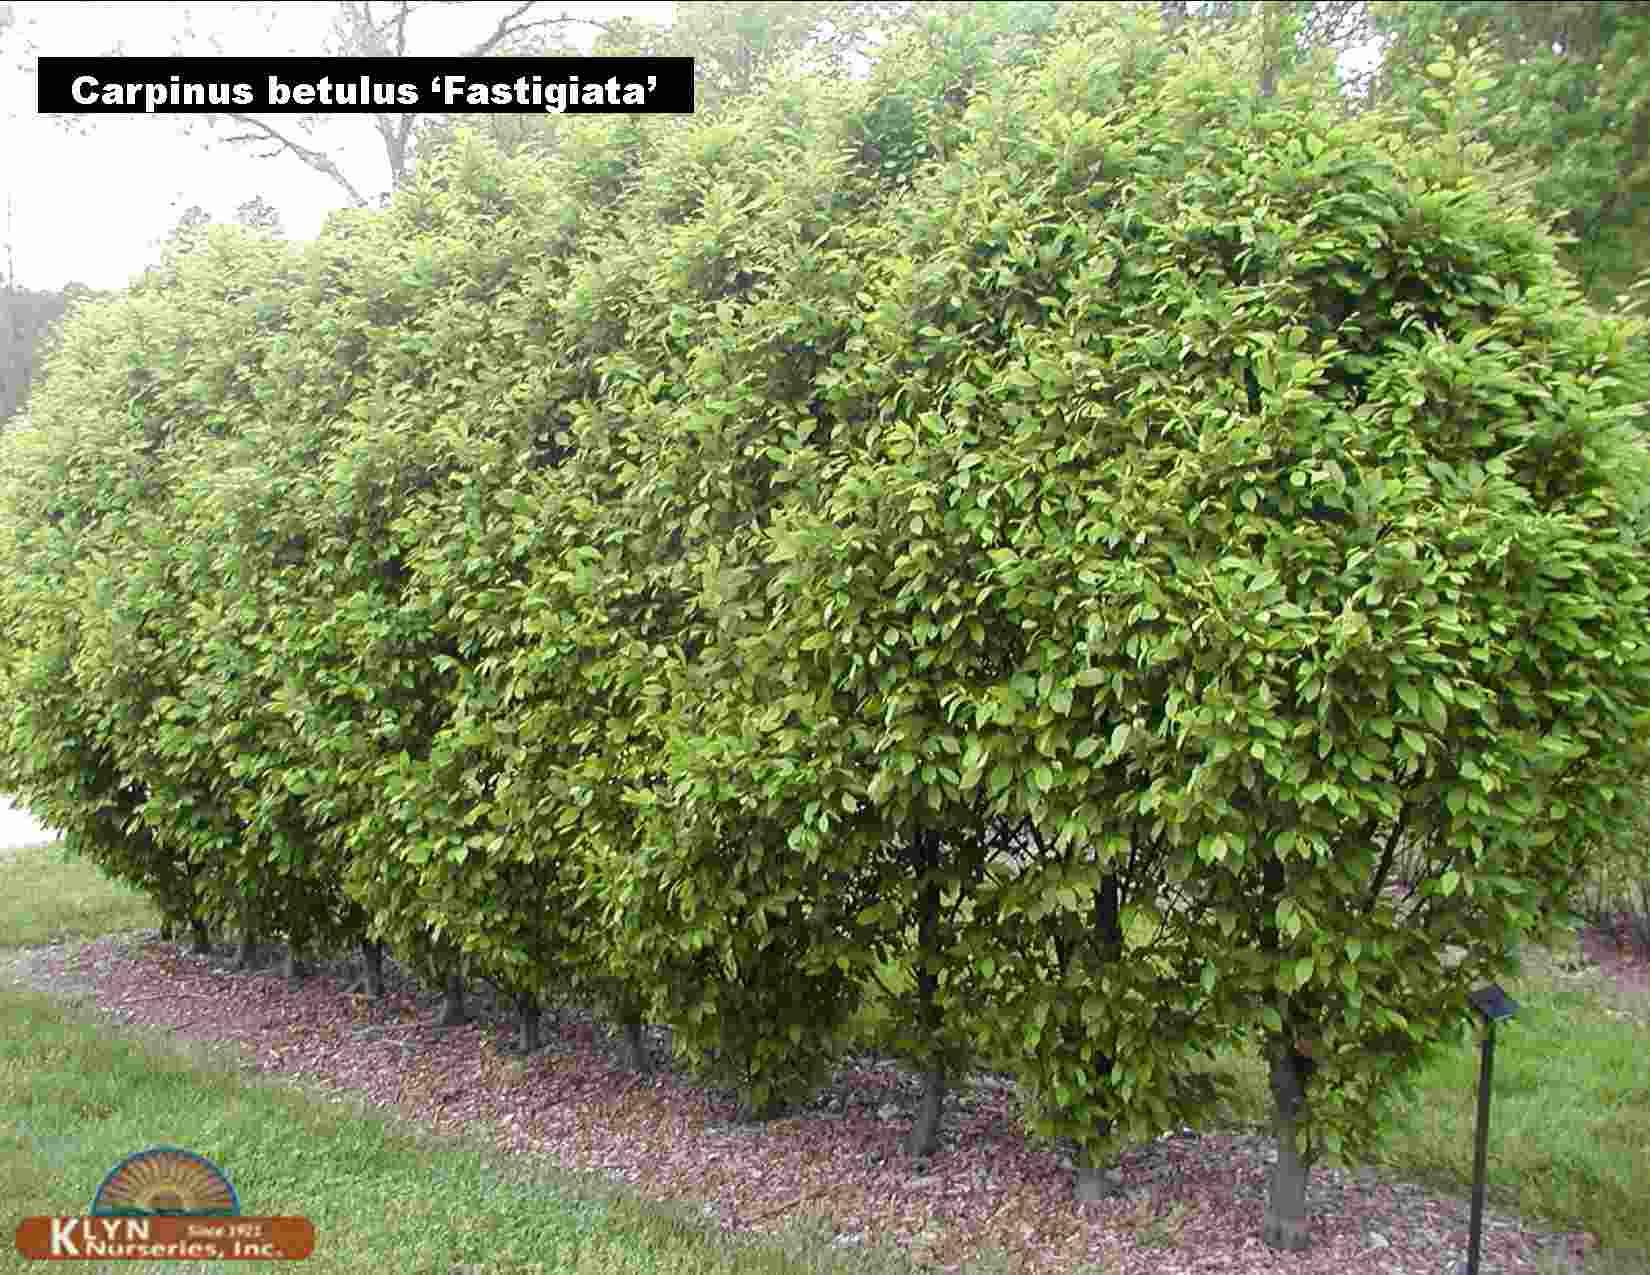 Carpinus Betulus Fastigiata Pyramidal European Hornbeam